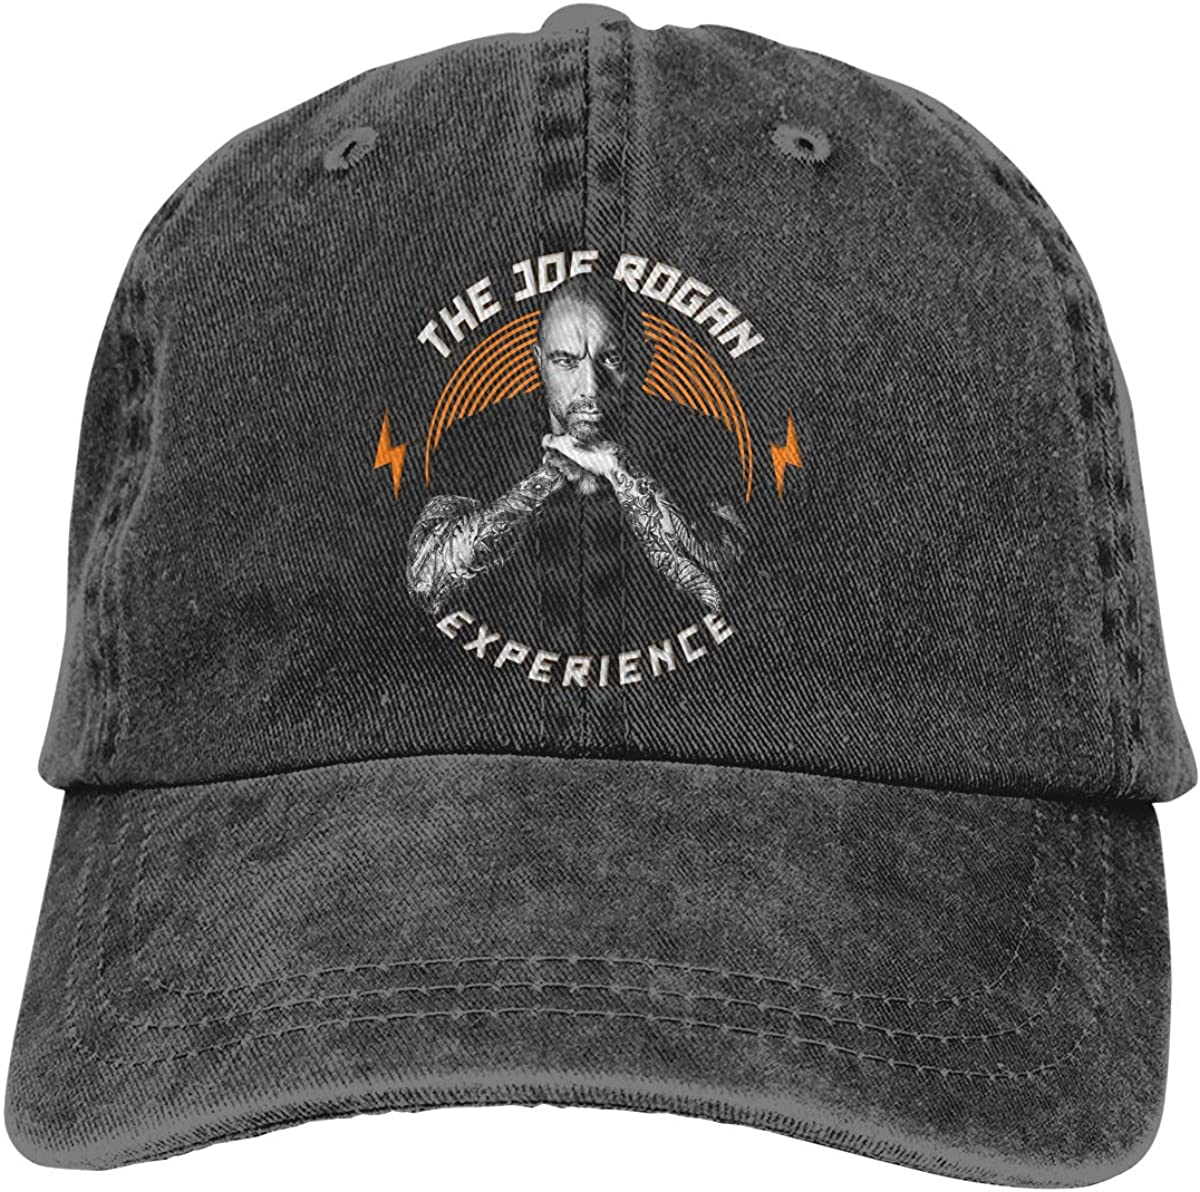 Men and Women 3D Printed Wild The Joe Rogan Experience Cowboy Hat Black